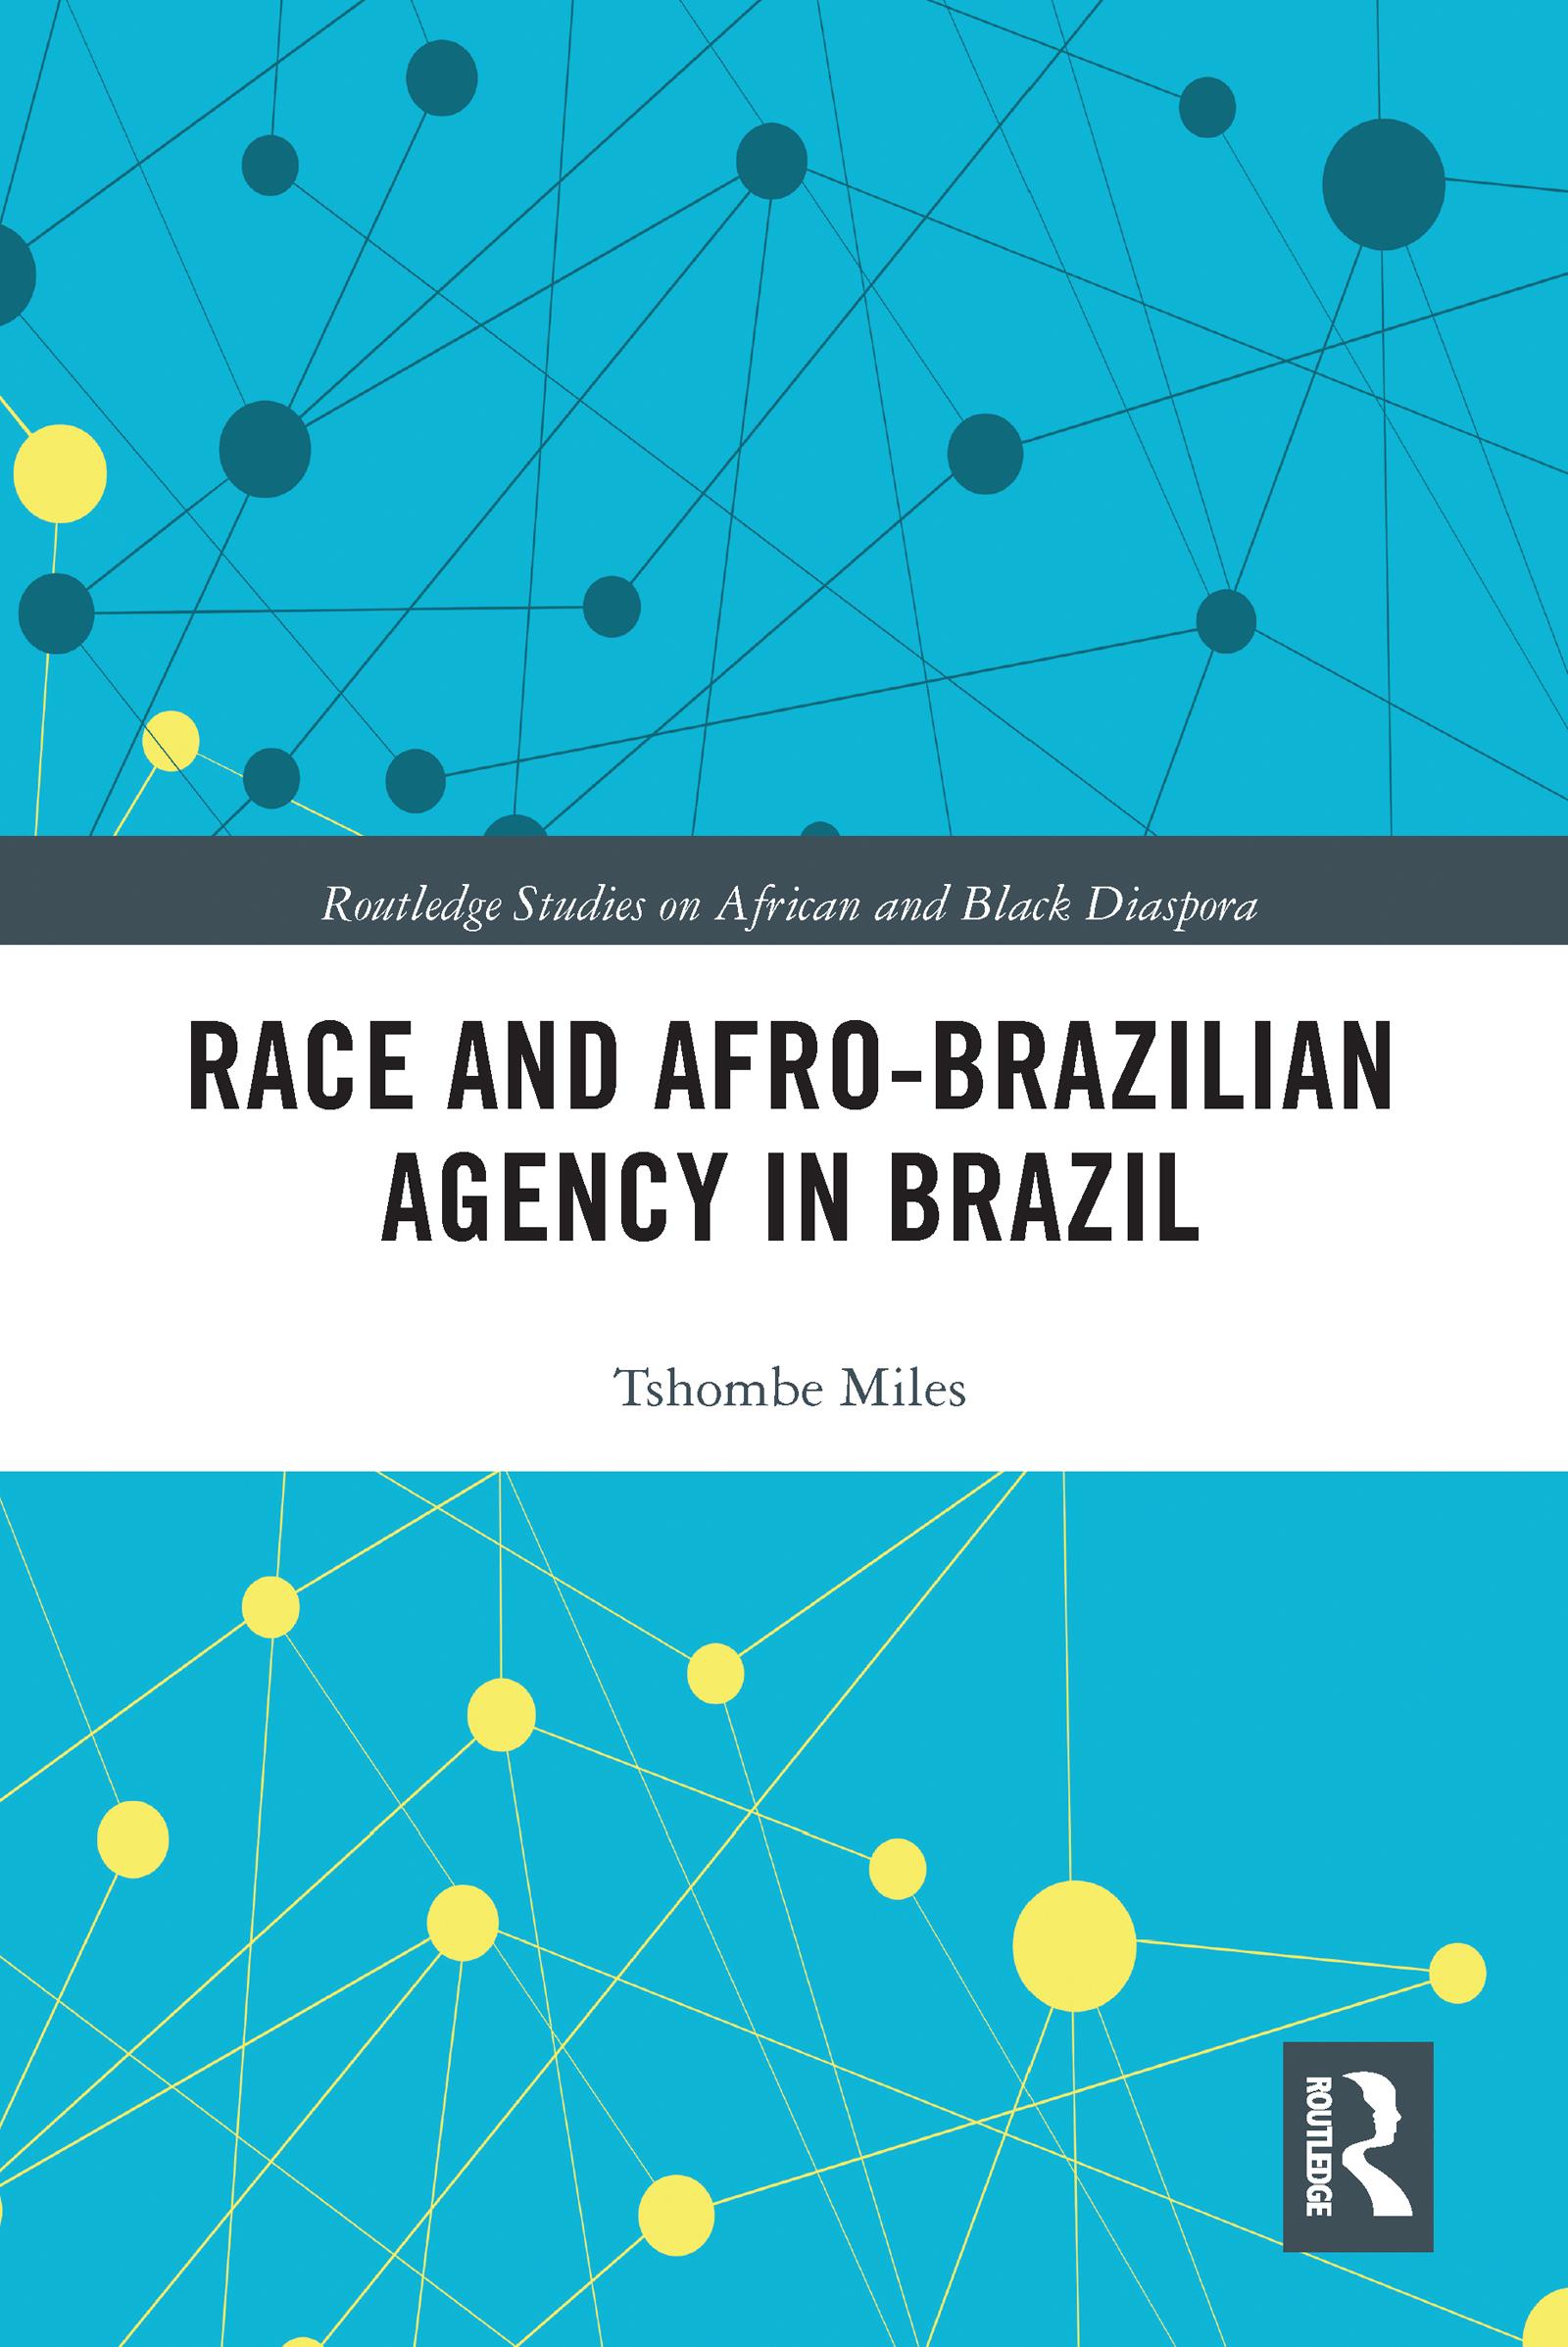 Race and Afro-Brazilian Agency in Brazil